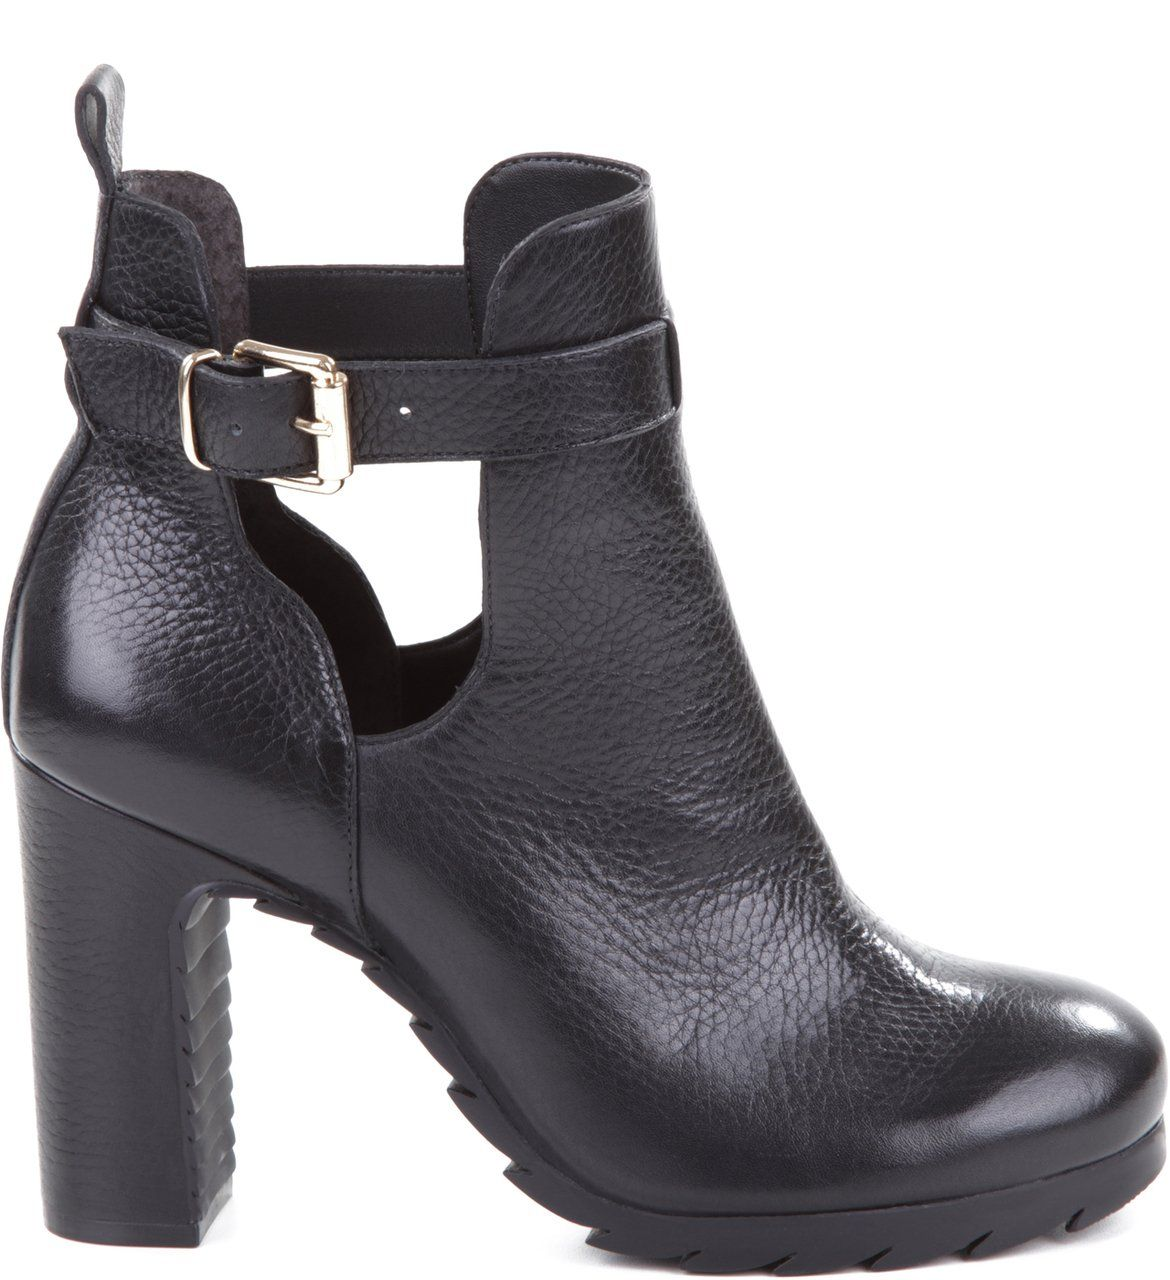 8b7fa8c90 Bota Couro Fivela Preta   Arezzo   Shoes em 2019   Shoes, Boots e ...